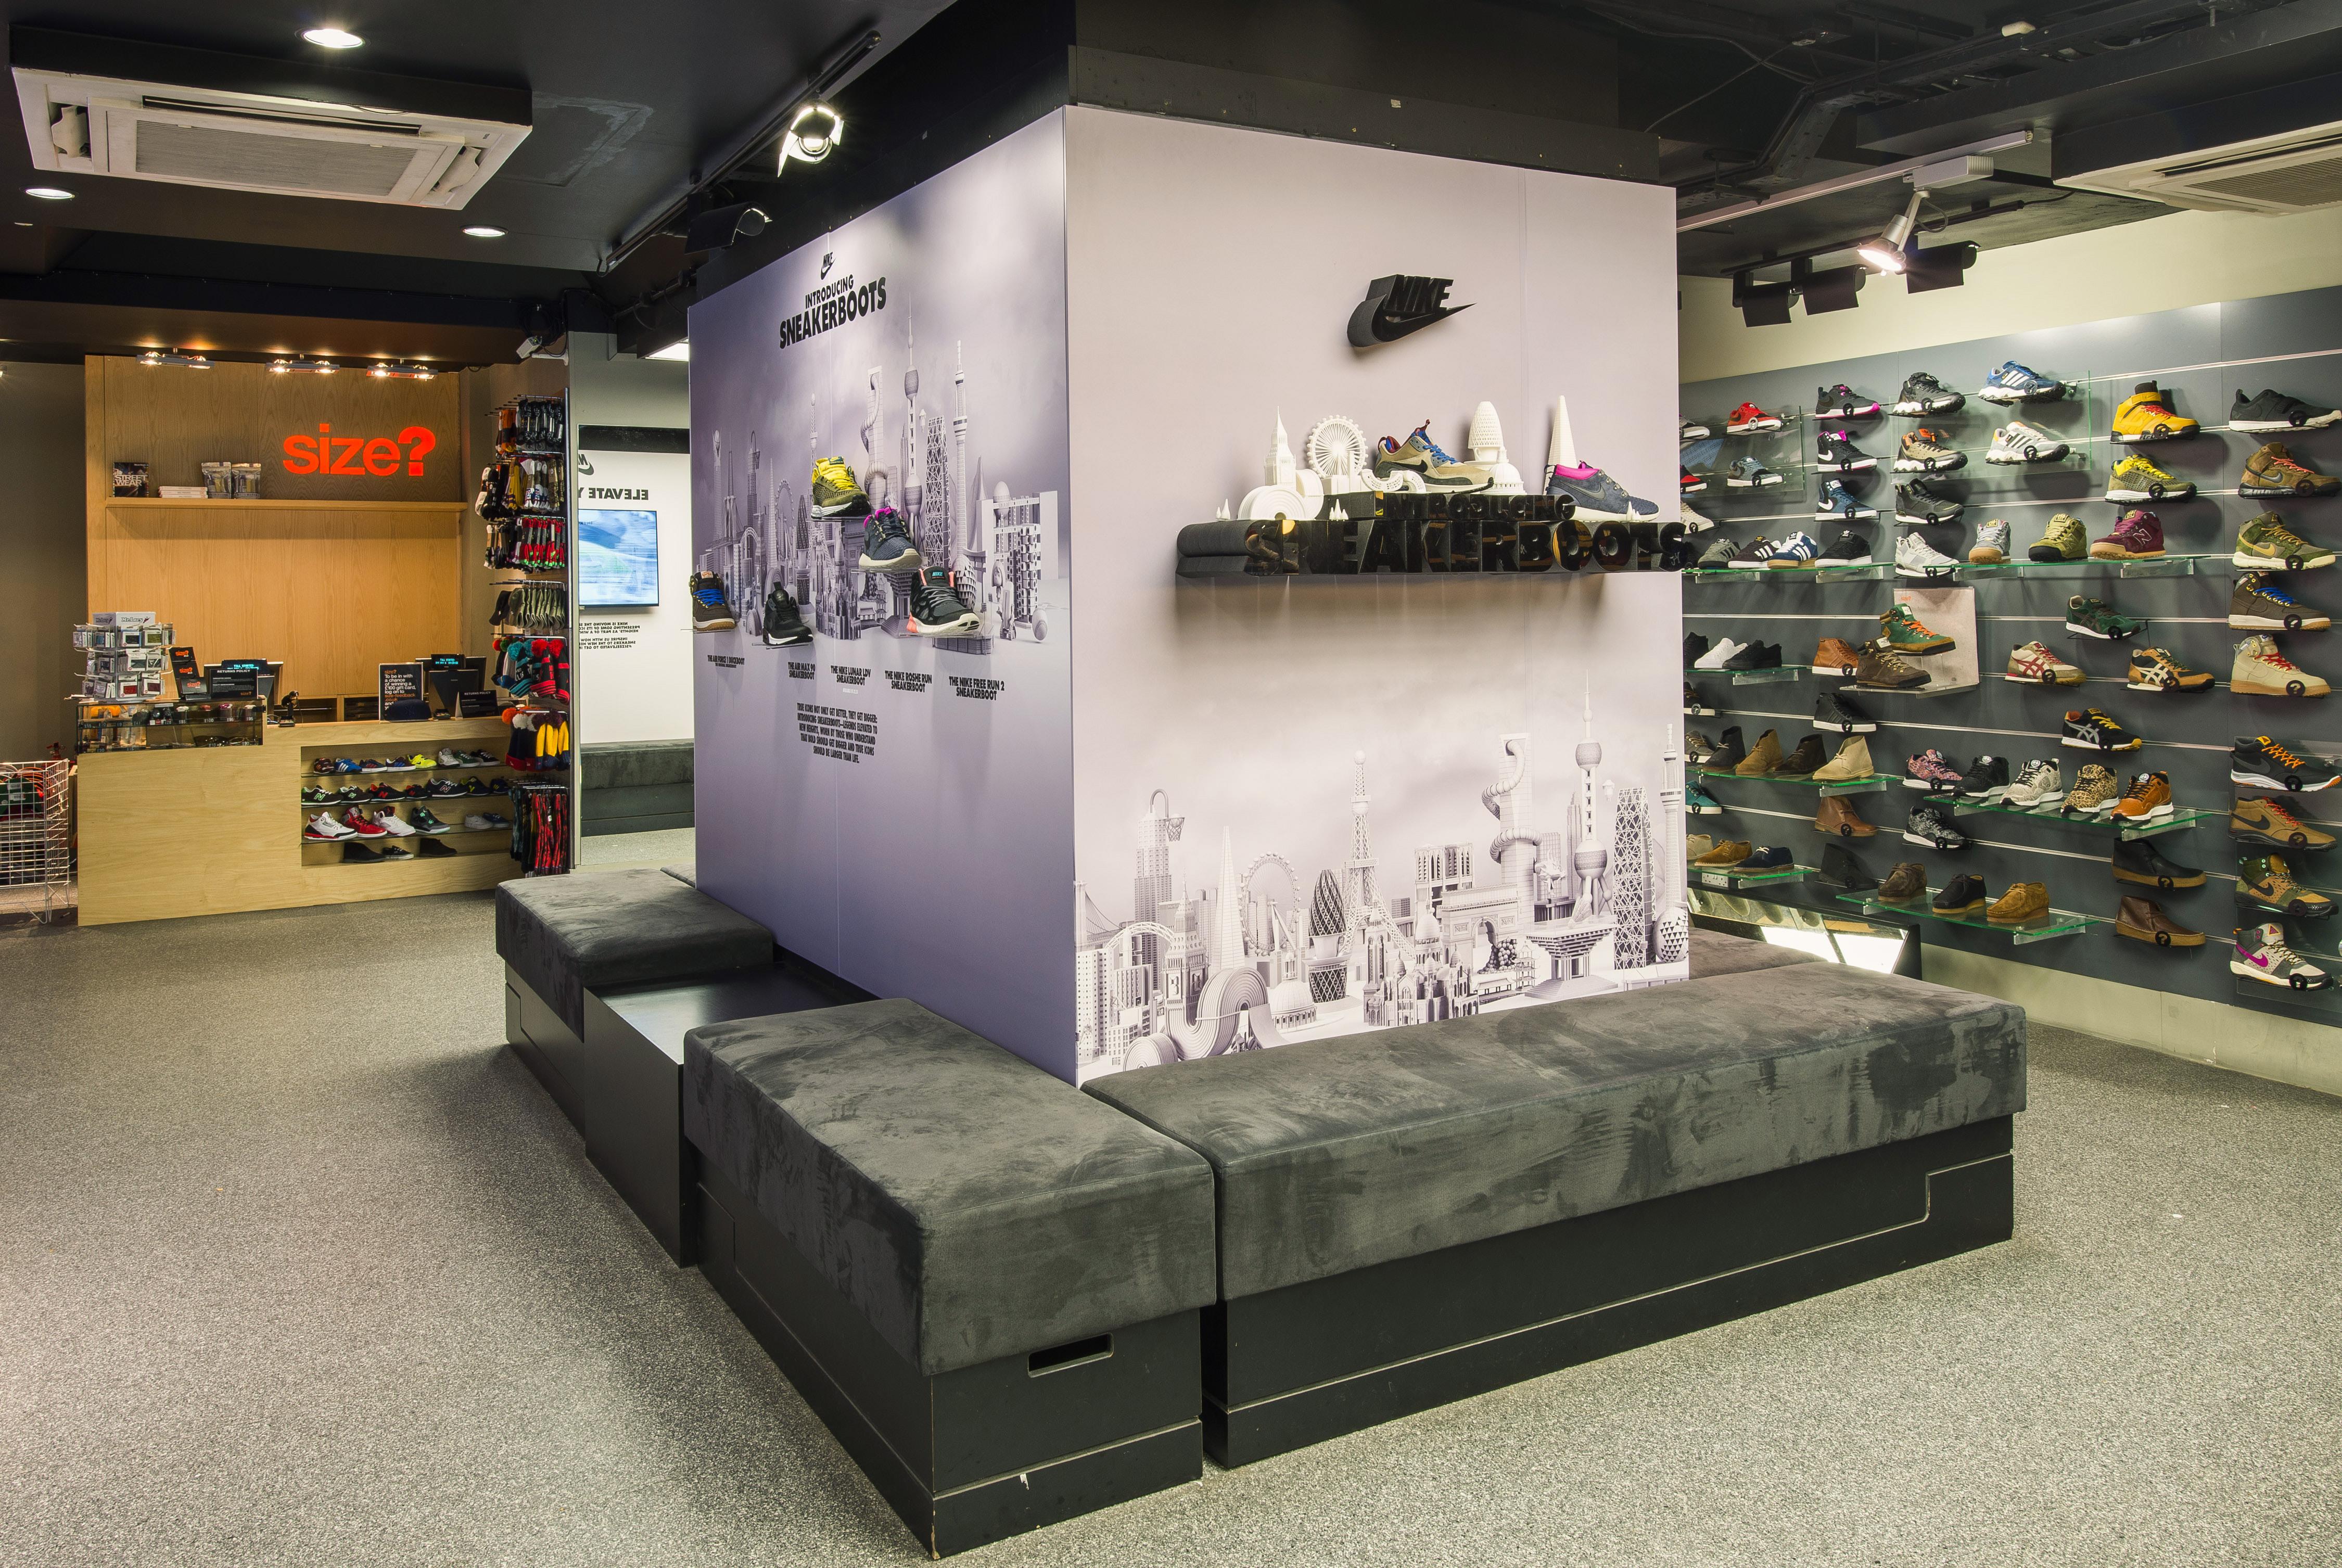 Nike_Airmax90_SizeCSt_06.11.13-02